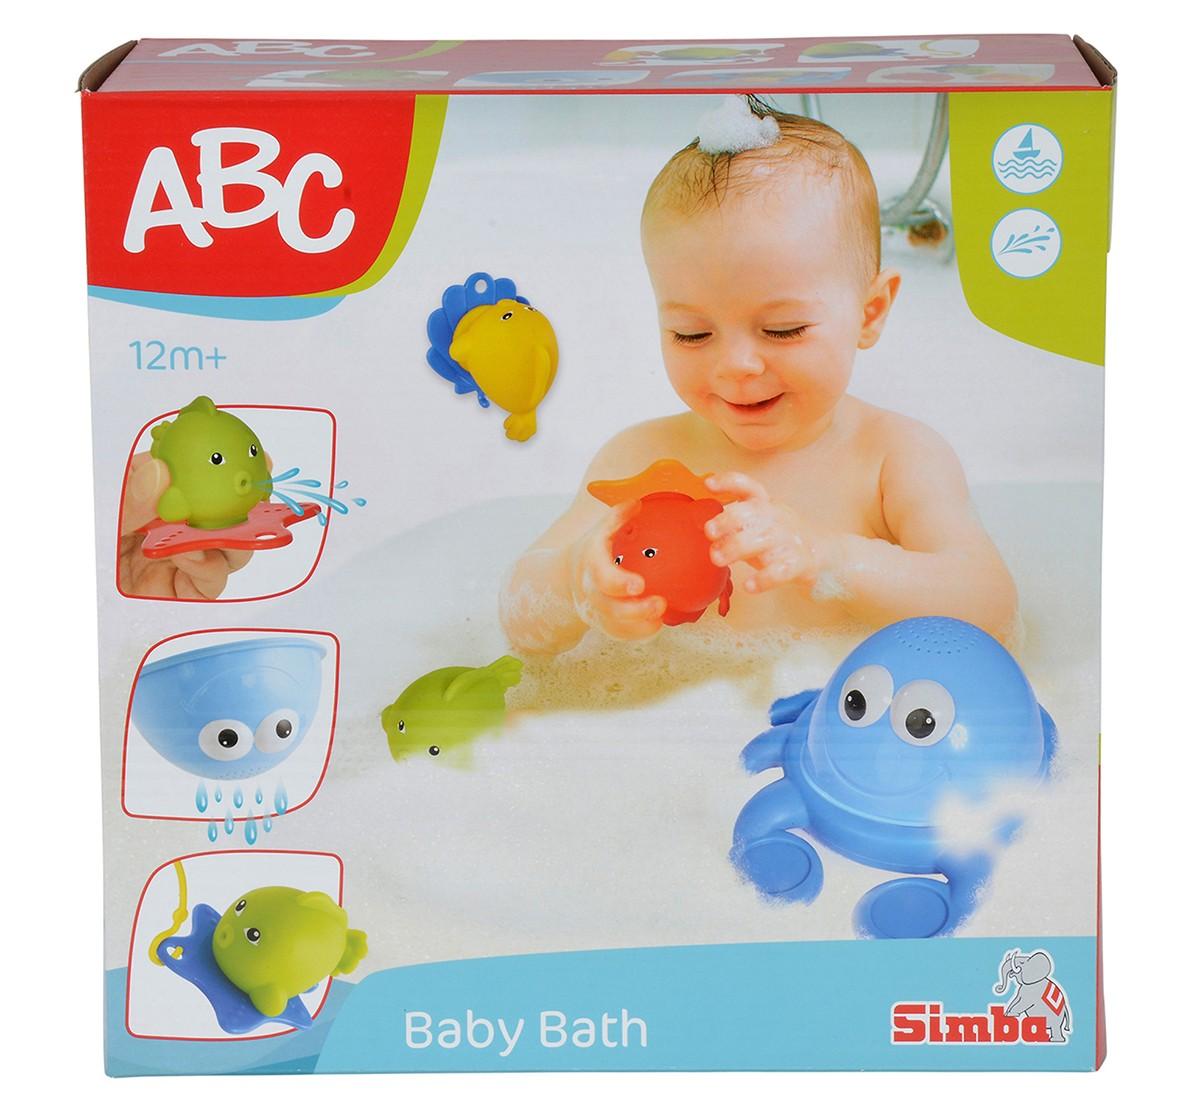 Simba Abc Bathing Crab, Unisex, 12M+ (Multicolor)